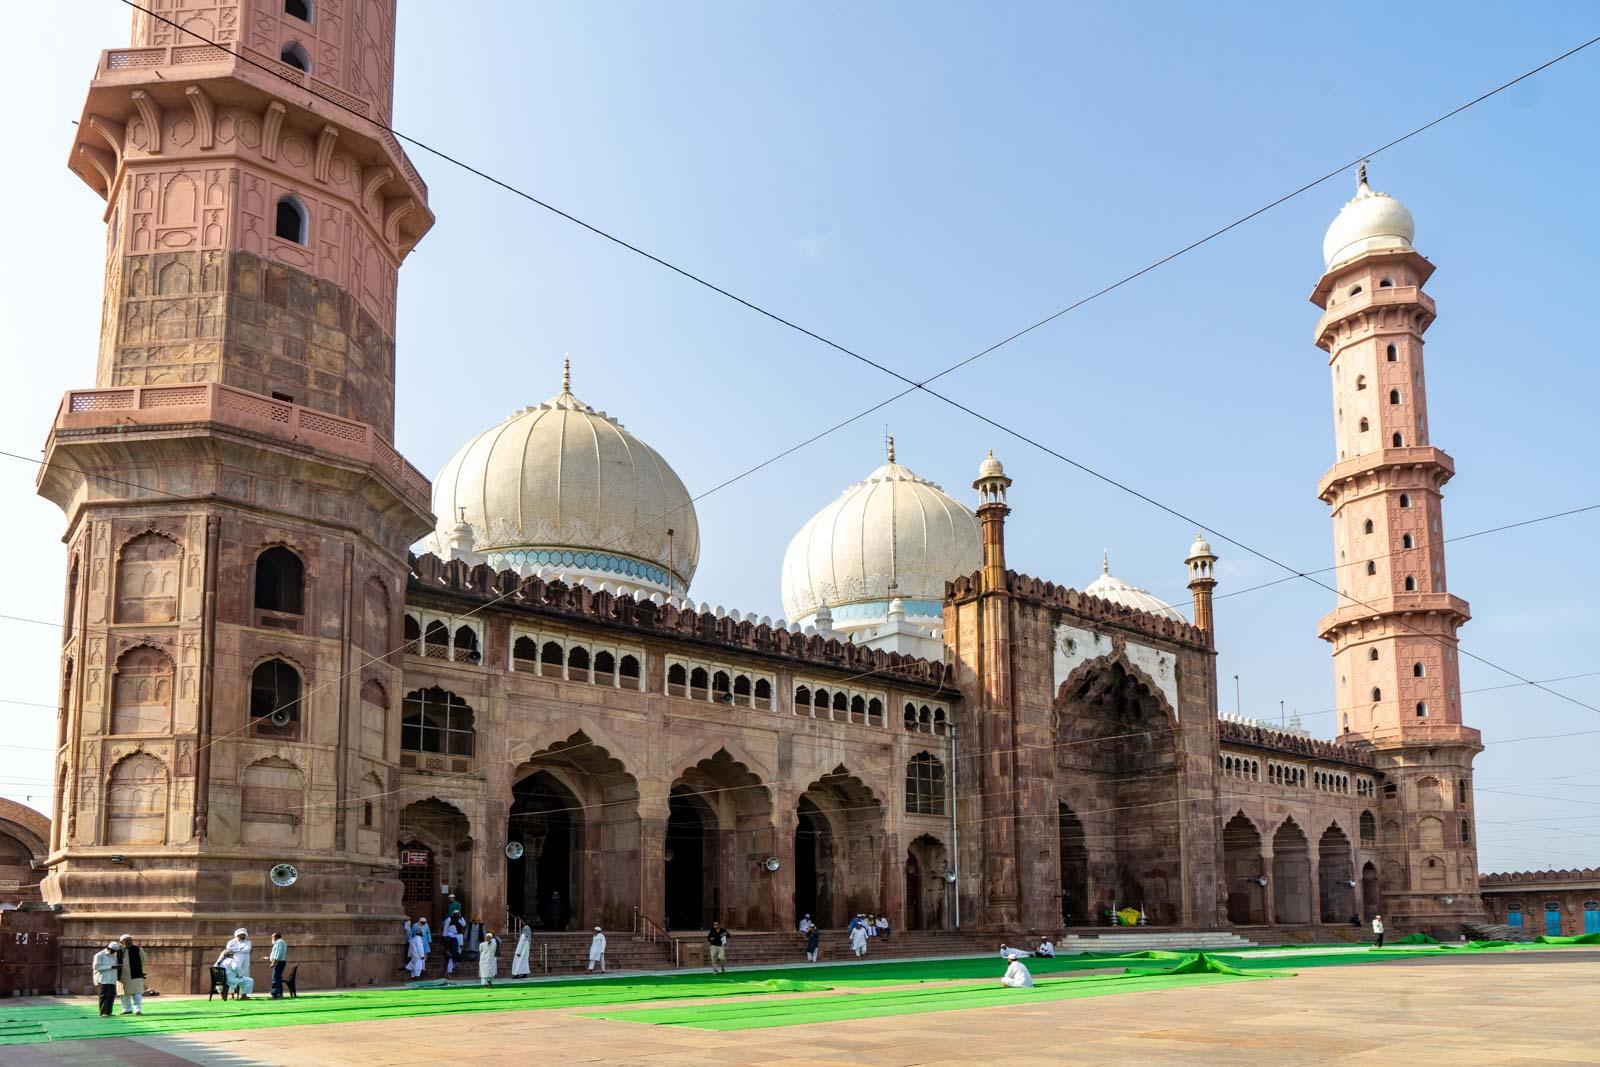 Taj-ul-Masajid mosque, Bhopal, India